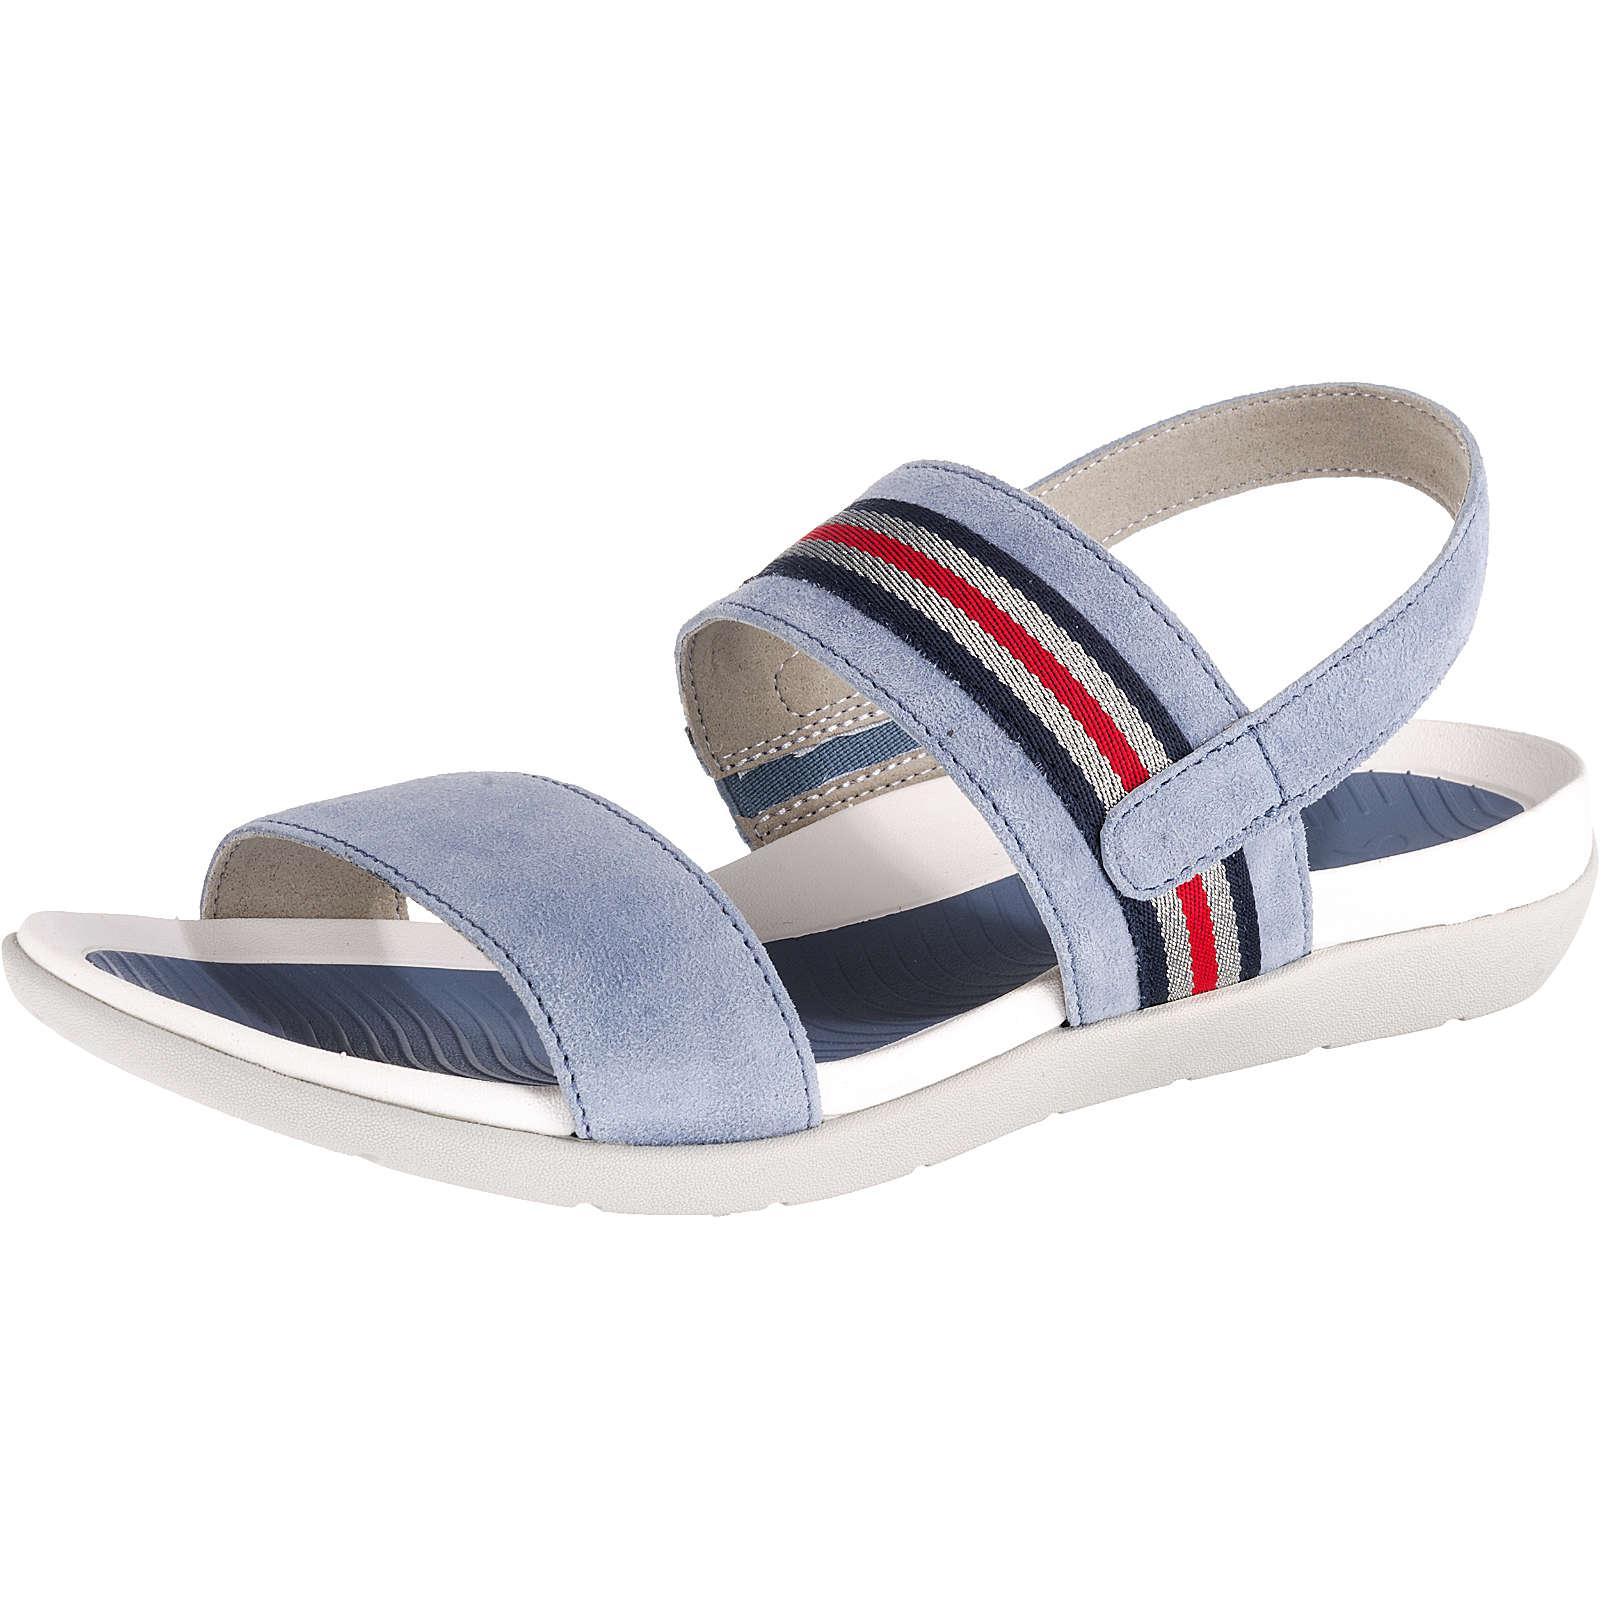 ara Nepal weit Klassische Sandalen hellblau Damen Gr. 40